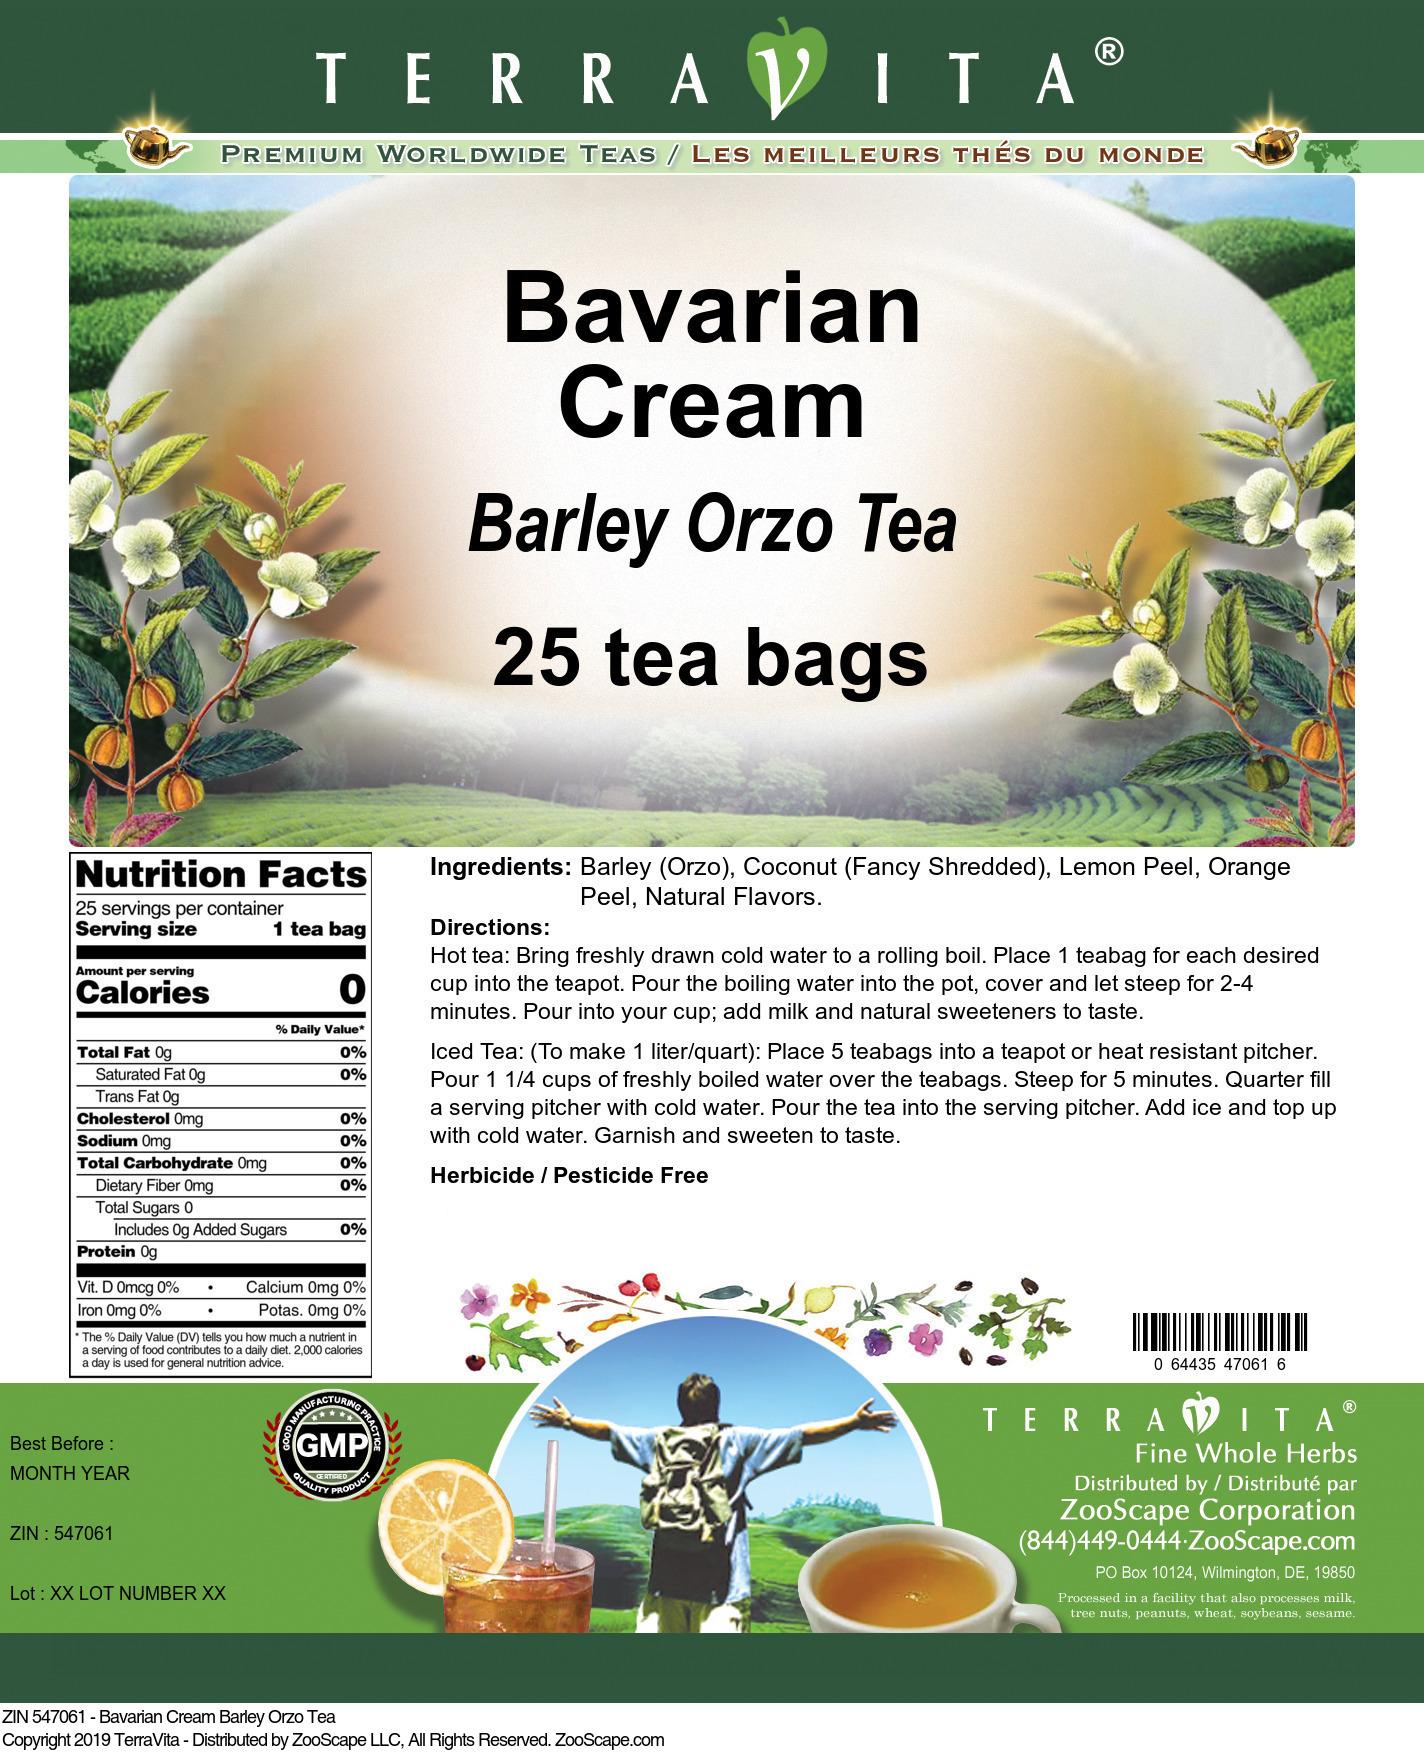 Bavarian Cream Barley Orzo Tea